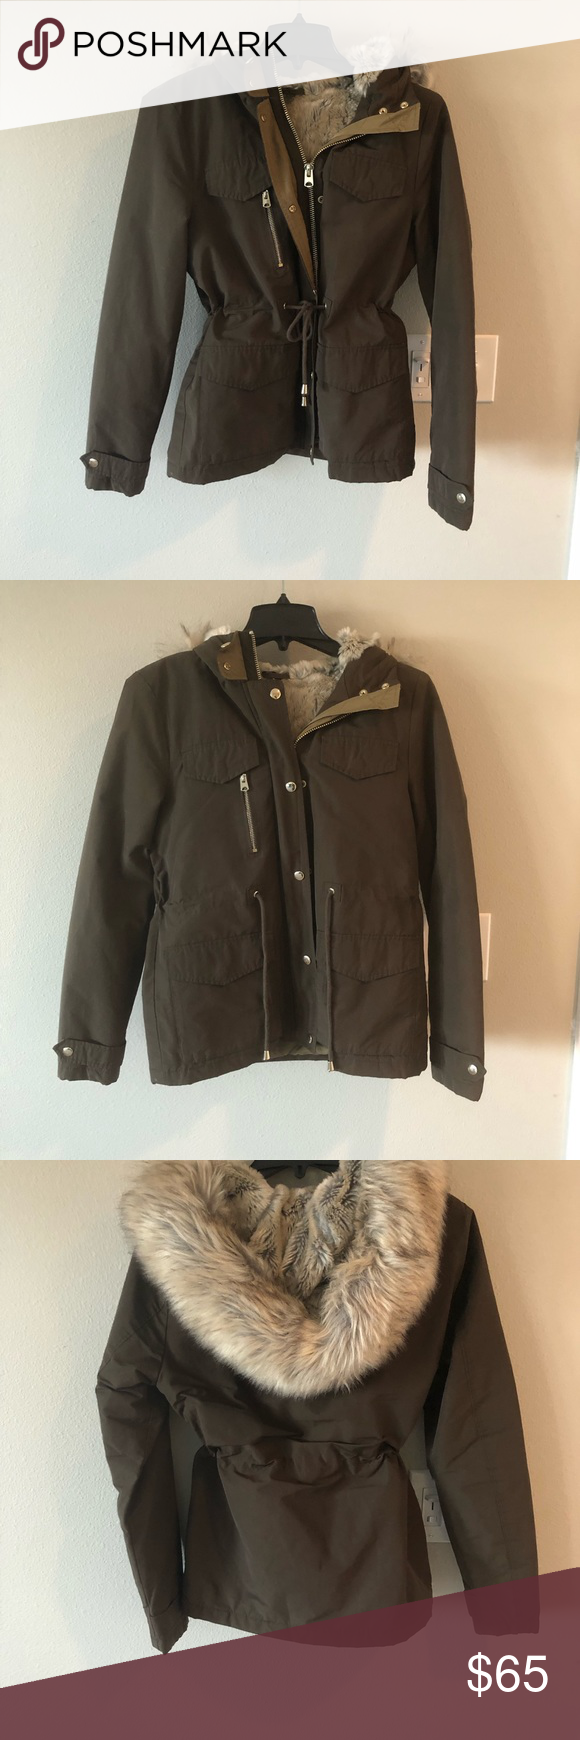 Top Shop brand fur lined jacket, size 6. Pristine